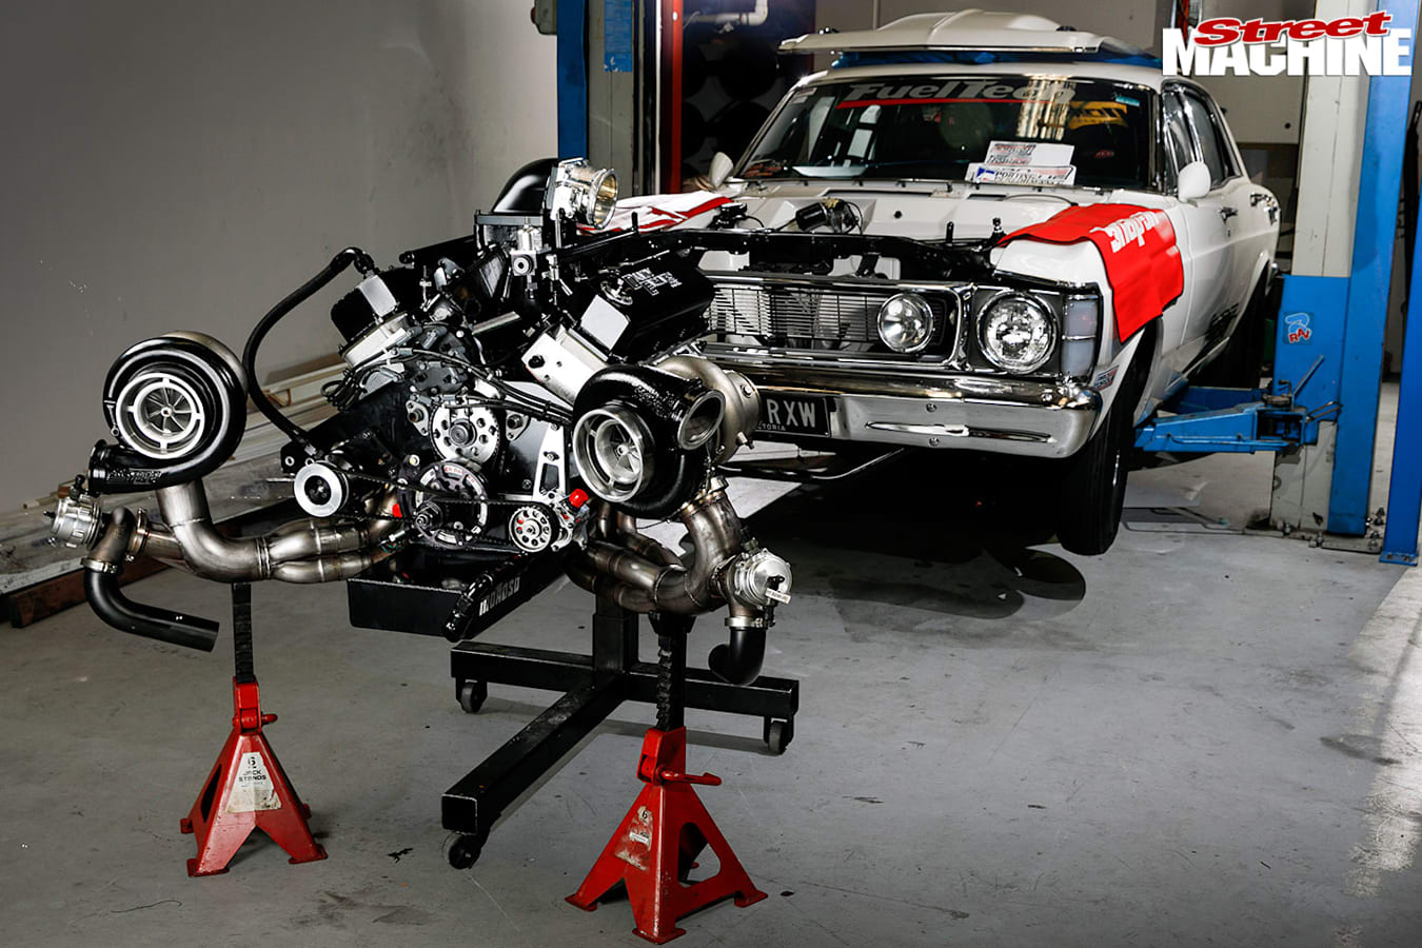 twin-turbo Windsor engine